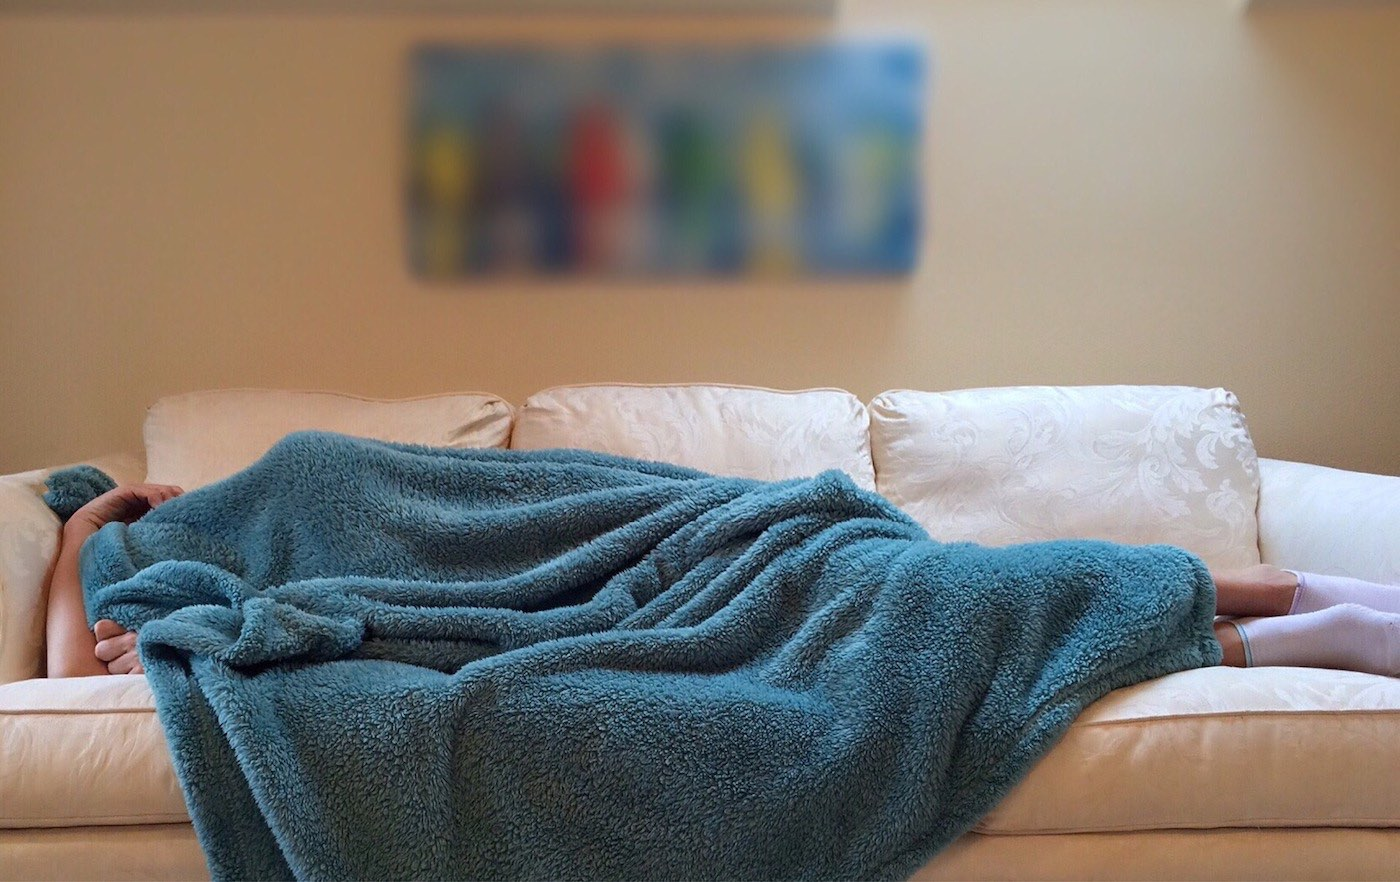 health-goodnight-couch-tips-sleep-testing-study-apnea-snoring-amerisleep-treatment-diagnostics-sleepmed-narcolepsy